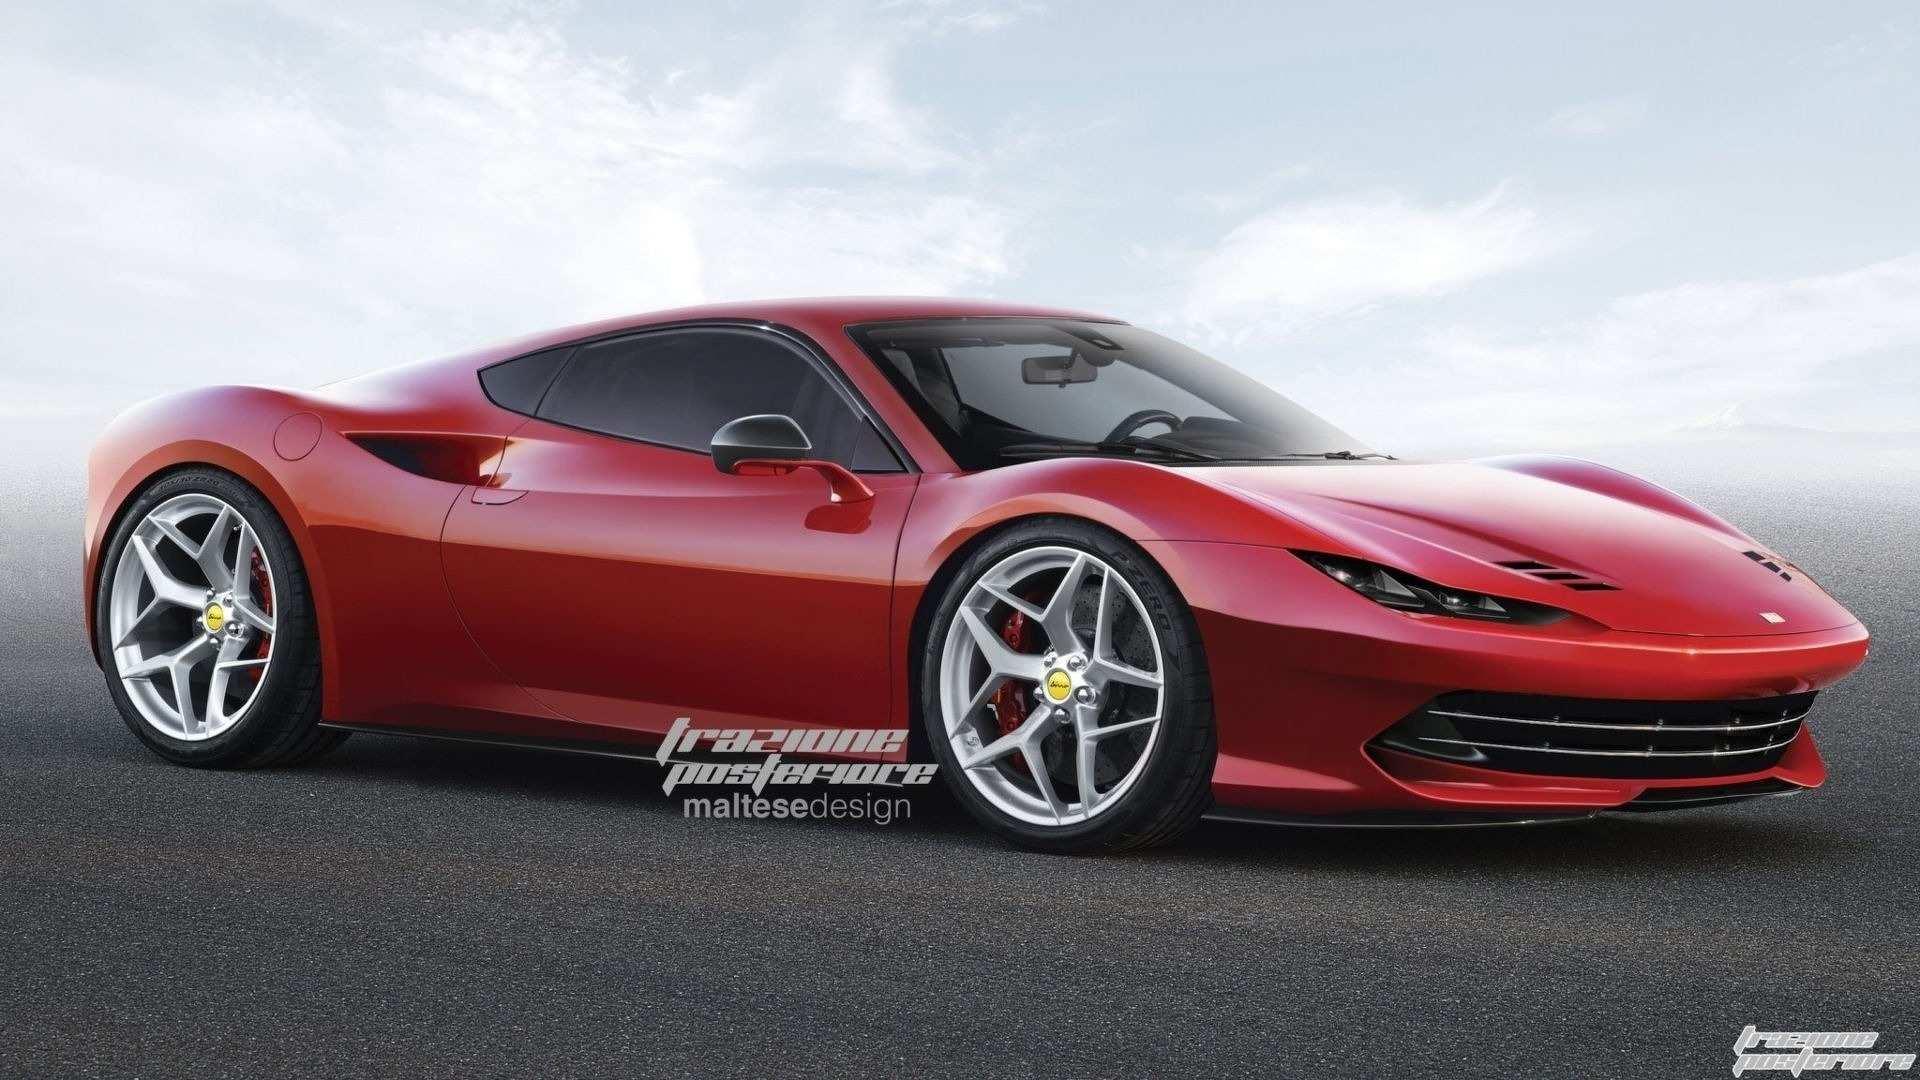 19 The Ferrari Modelle 2019 New Concept with Ferrari Modelle 2019